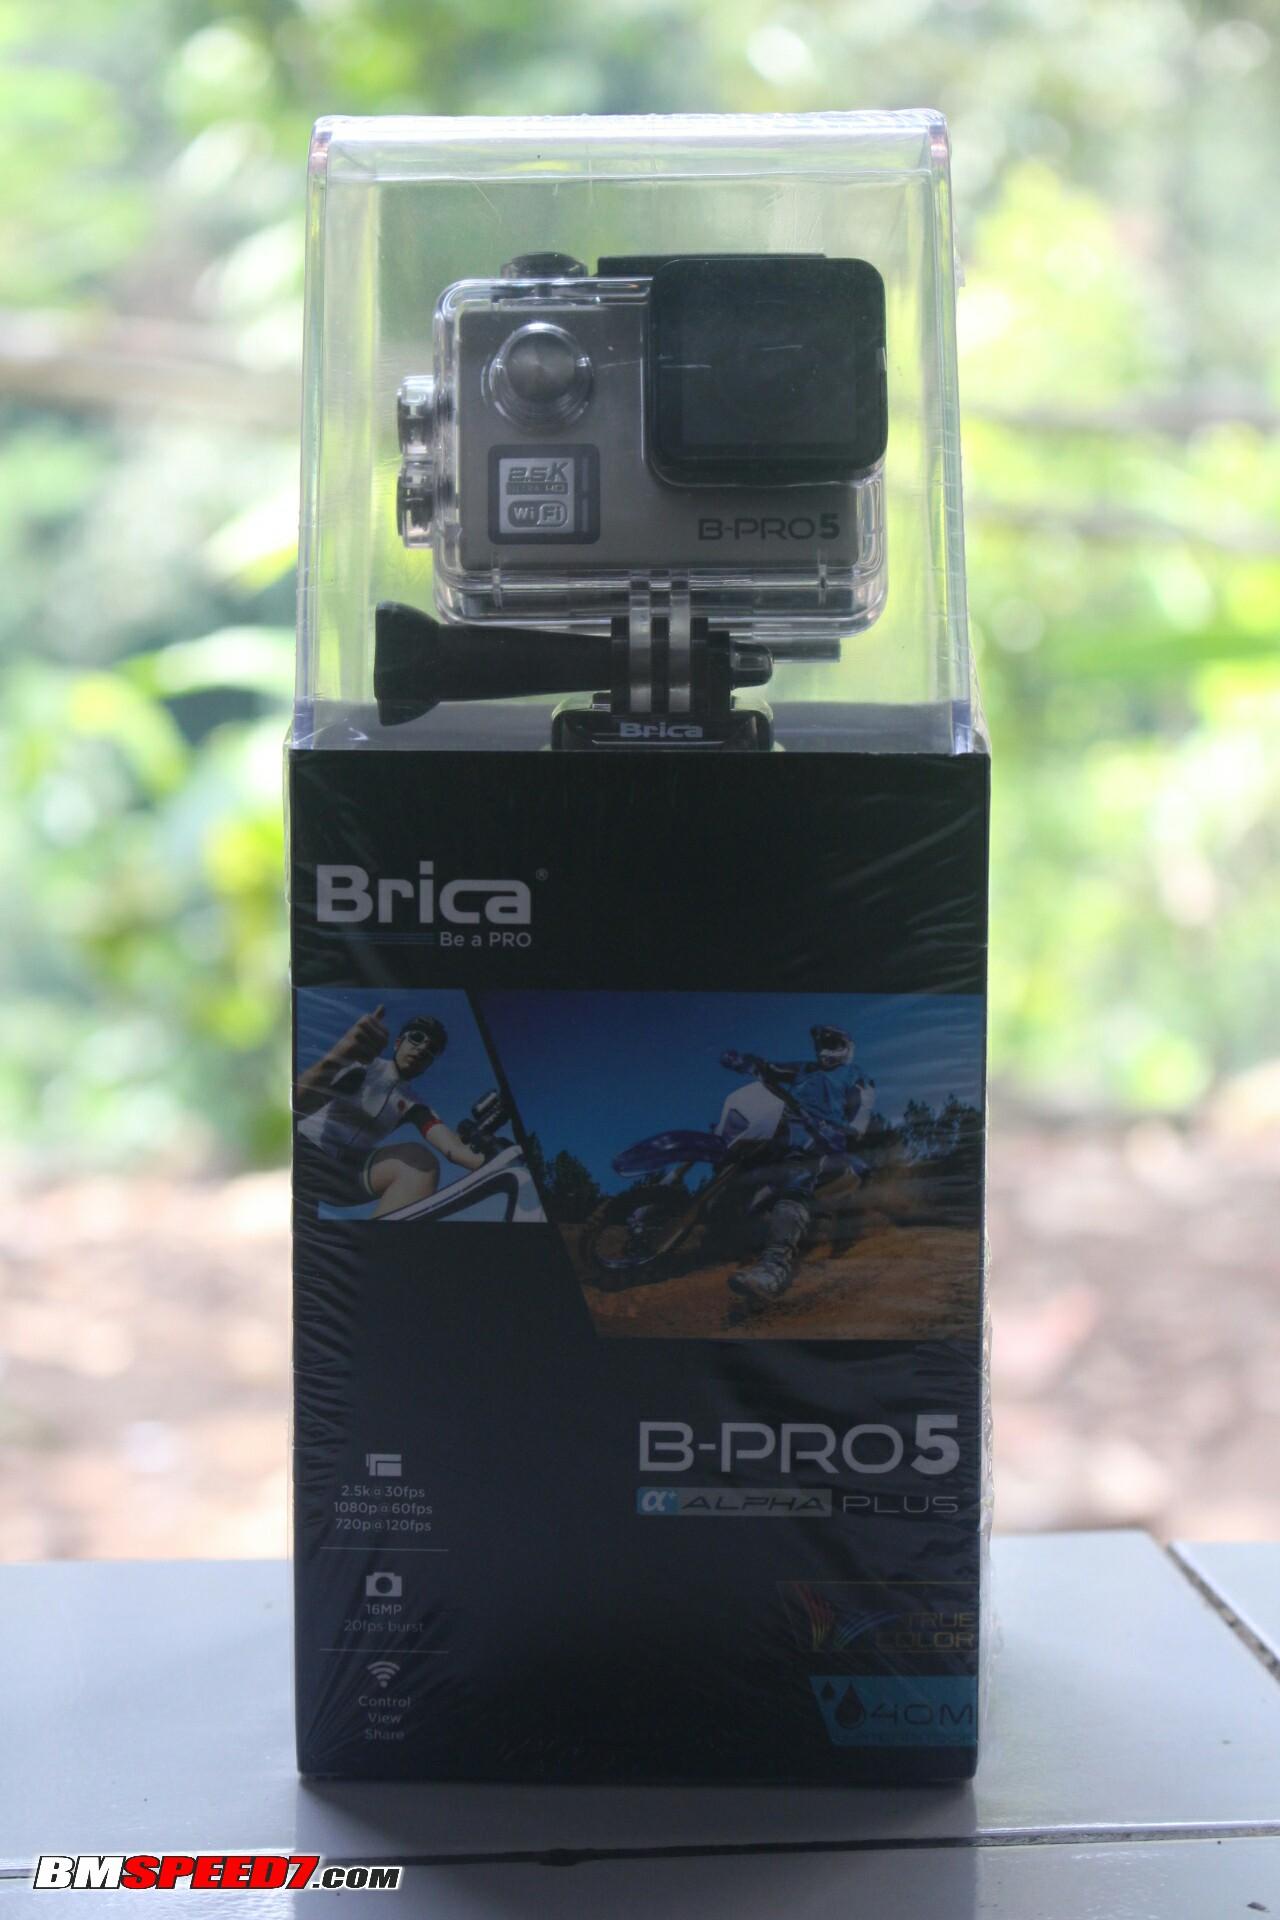 Unboxing Action Camera Bpro5 Alpha Plus Apa Saja Isi Didalamnya Brica B Pro5 Edition Mark Iis 4k Komplit Ae2s 2s Ae 2 Brpo5